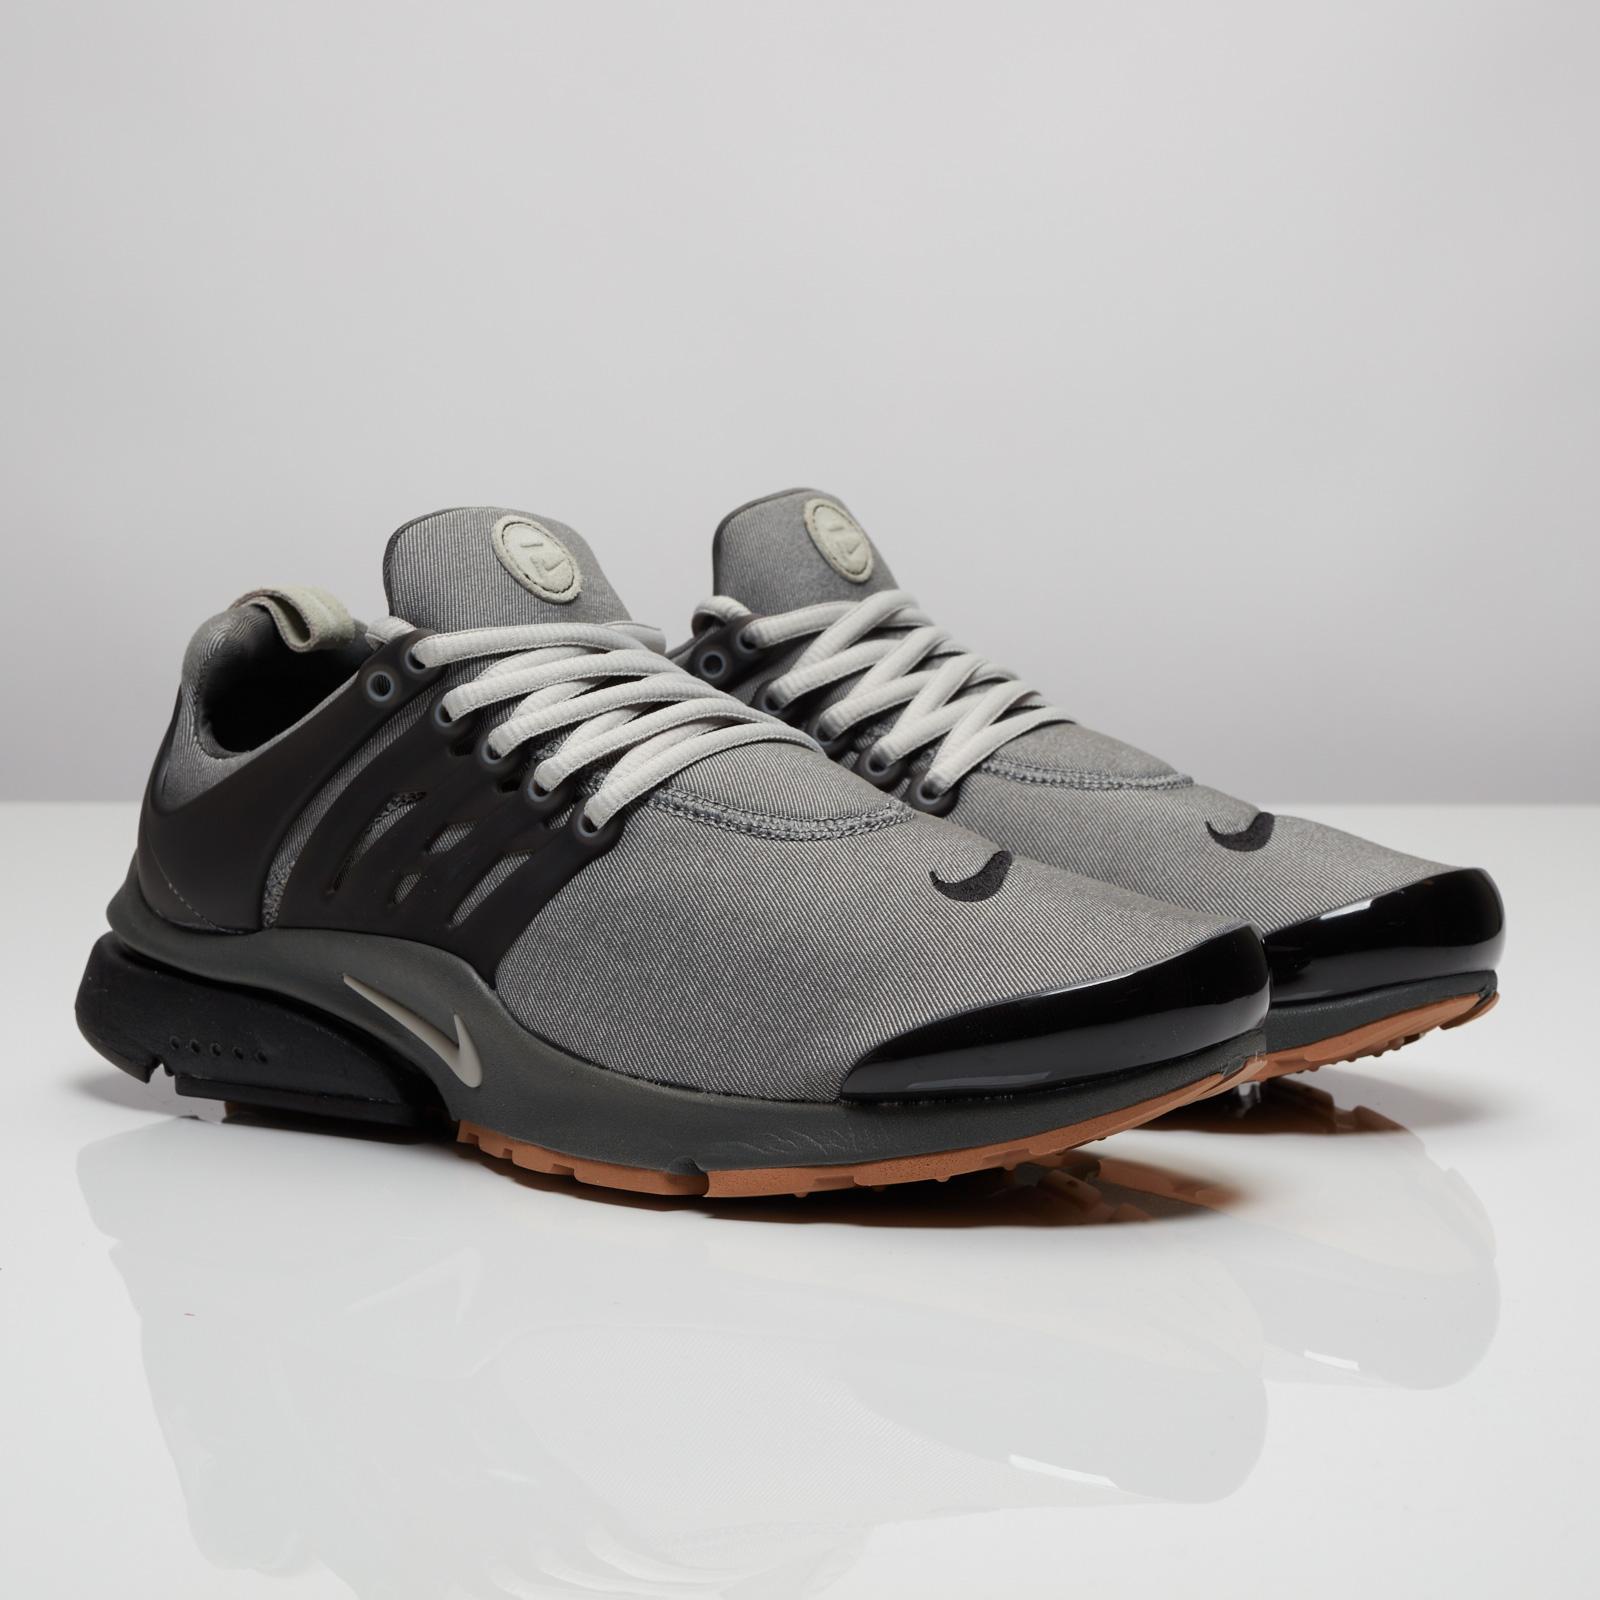 Nike Air Presto Premium - 848141-002 - SNS   sneakers & streetwear ...